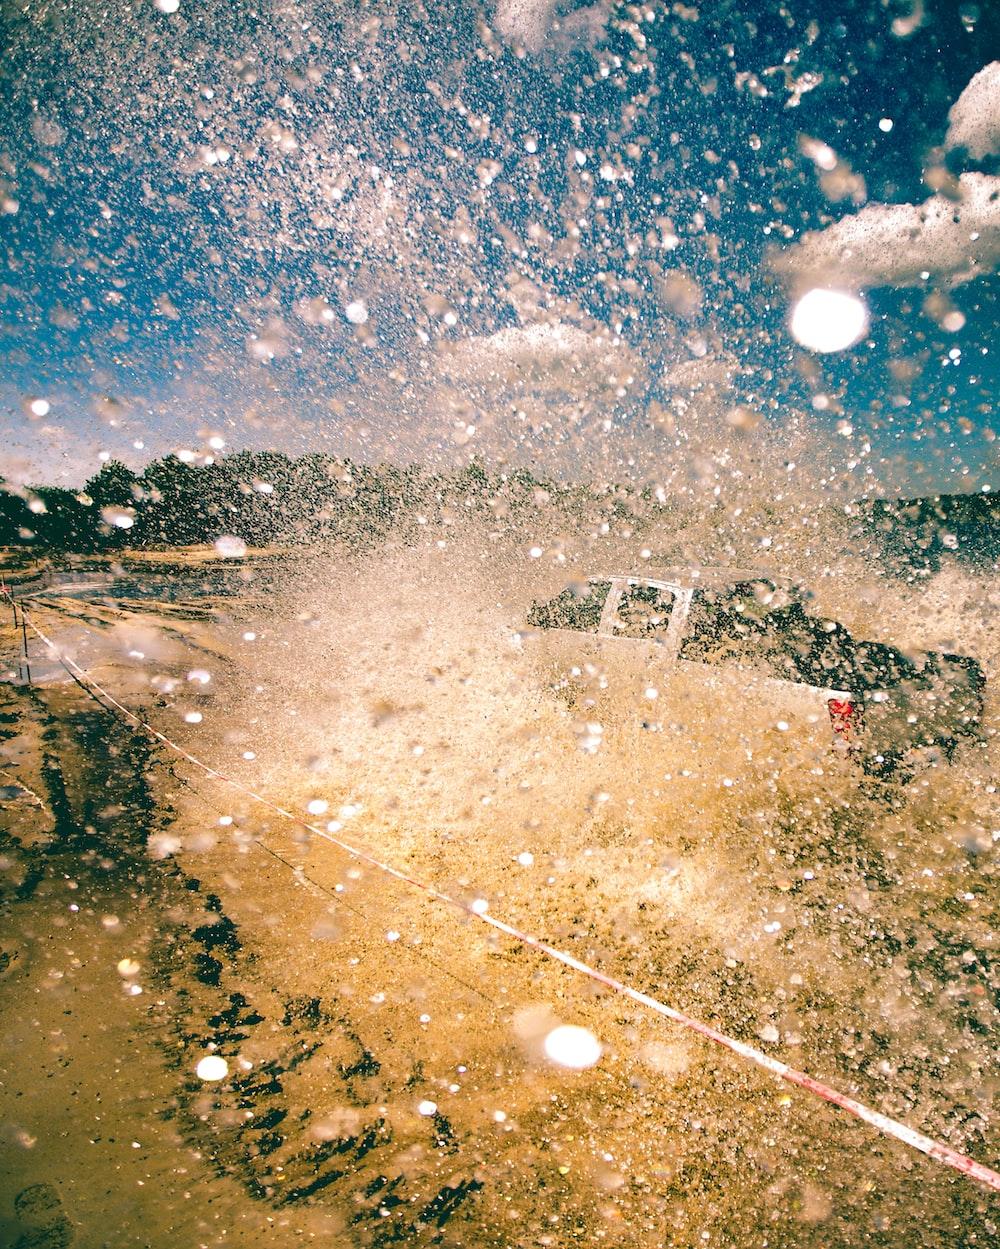 water sprinkles from pickup truck